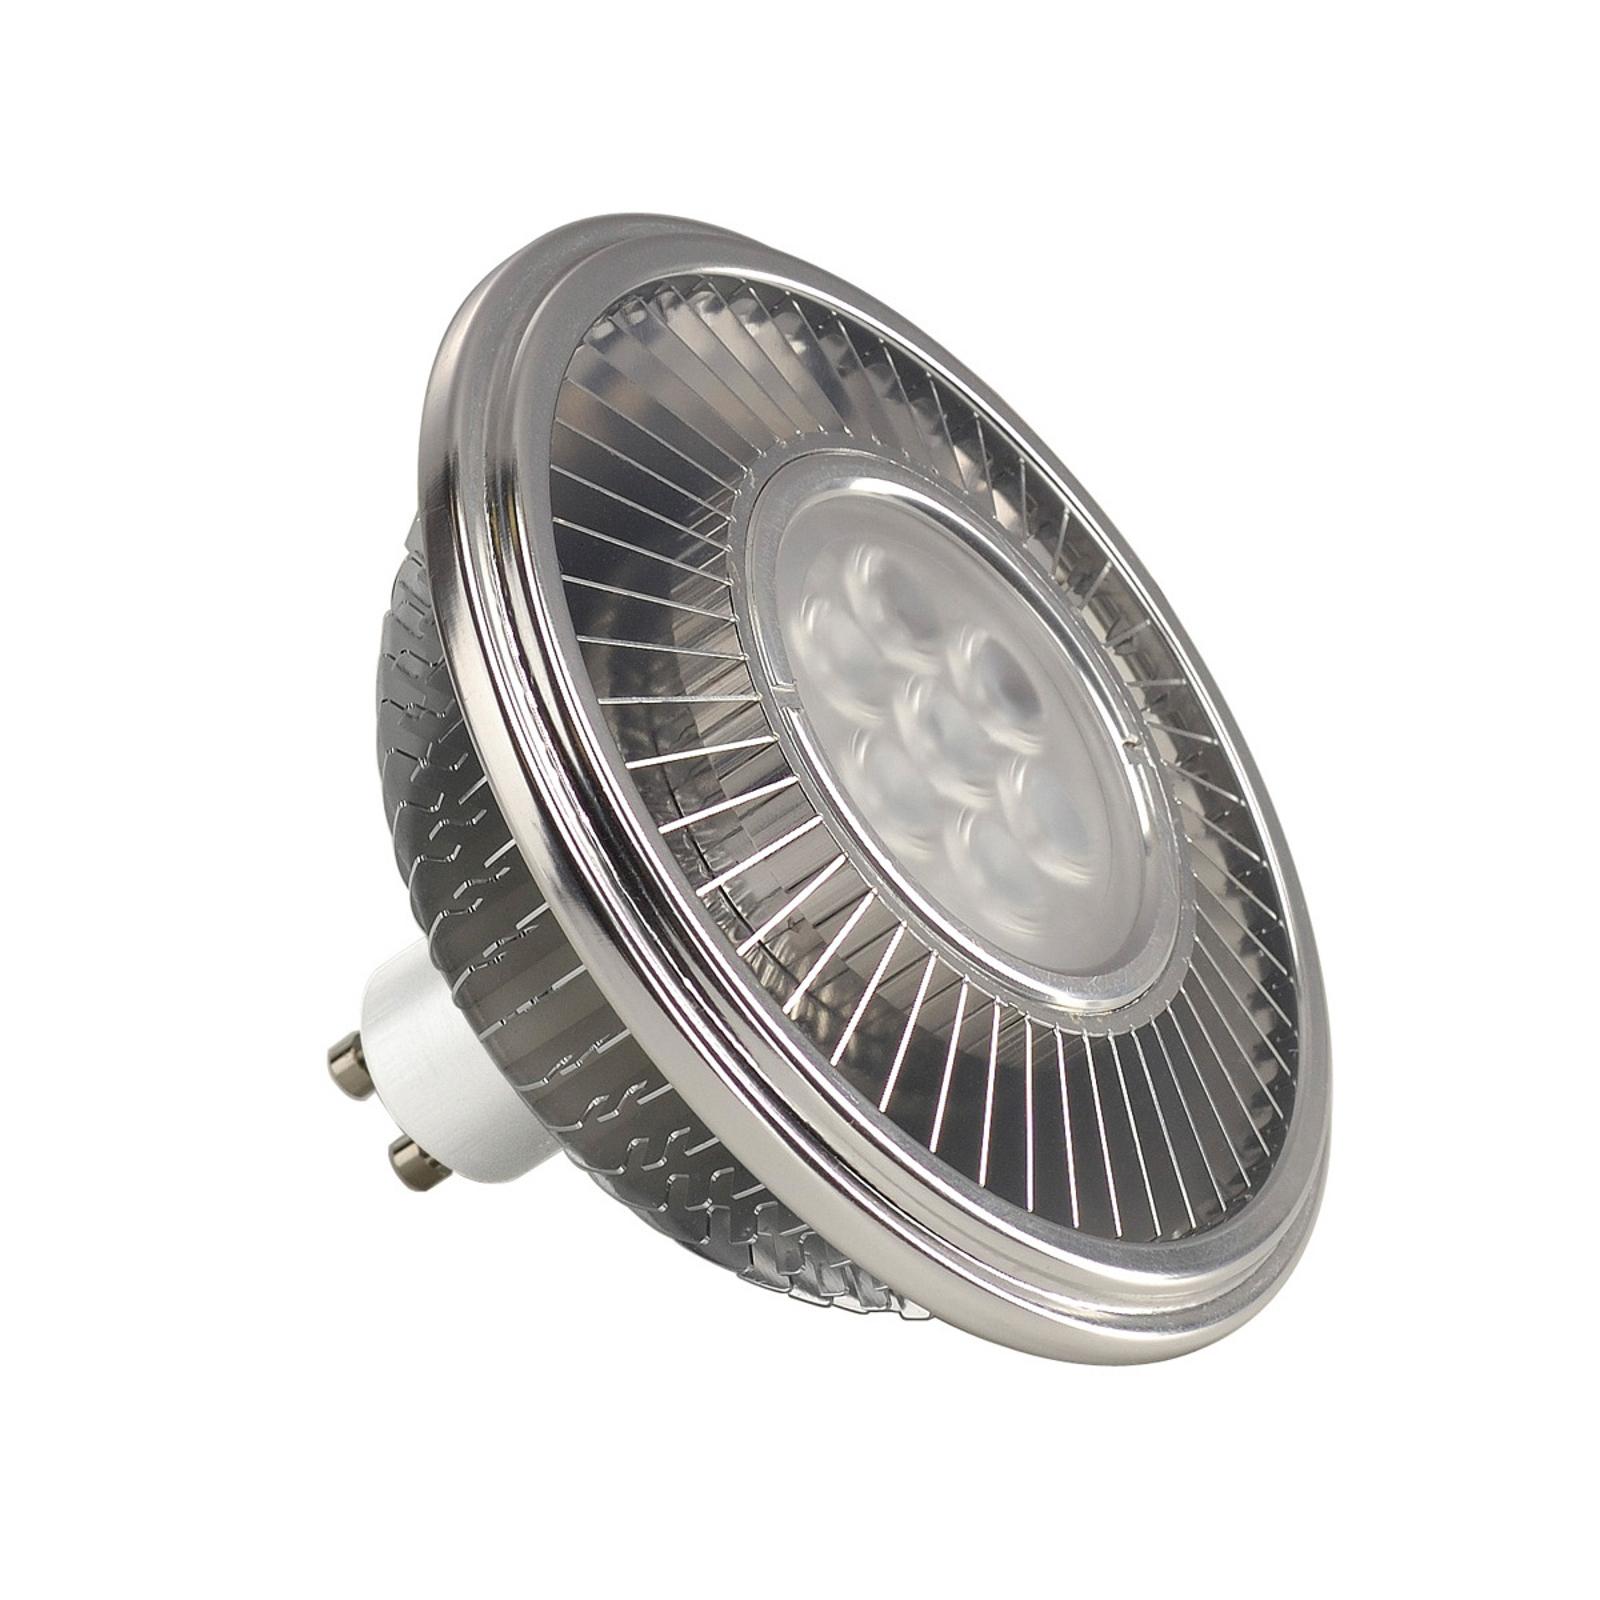 SLV reflektor LED GU10 111mm 13W 30° 2700K